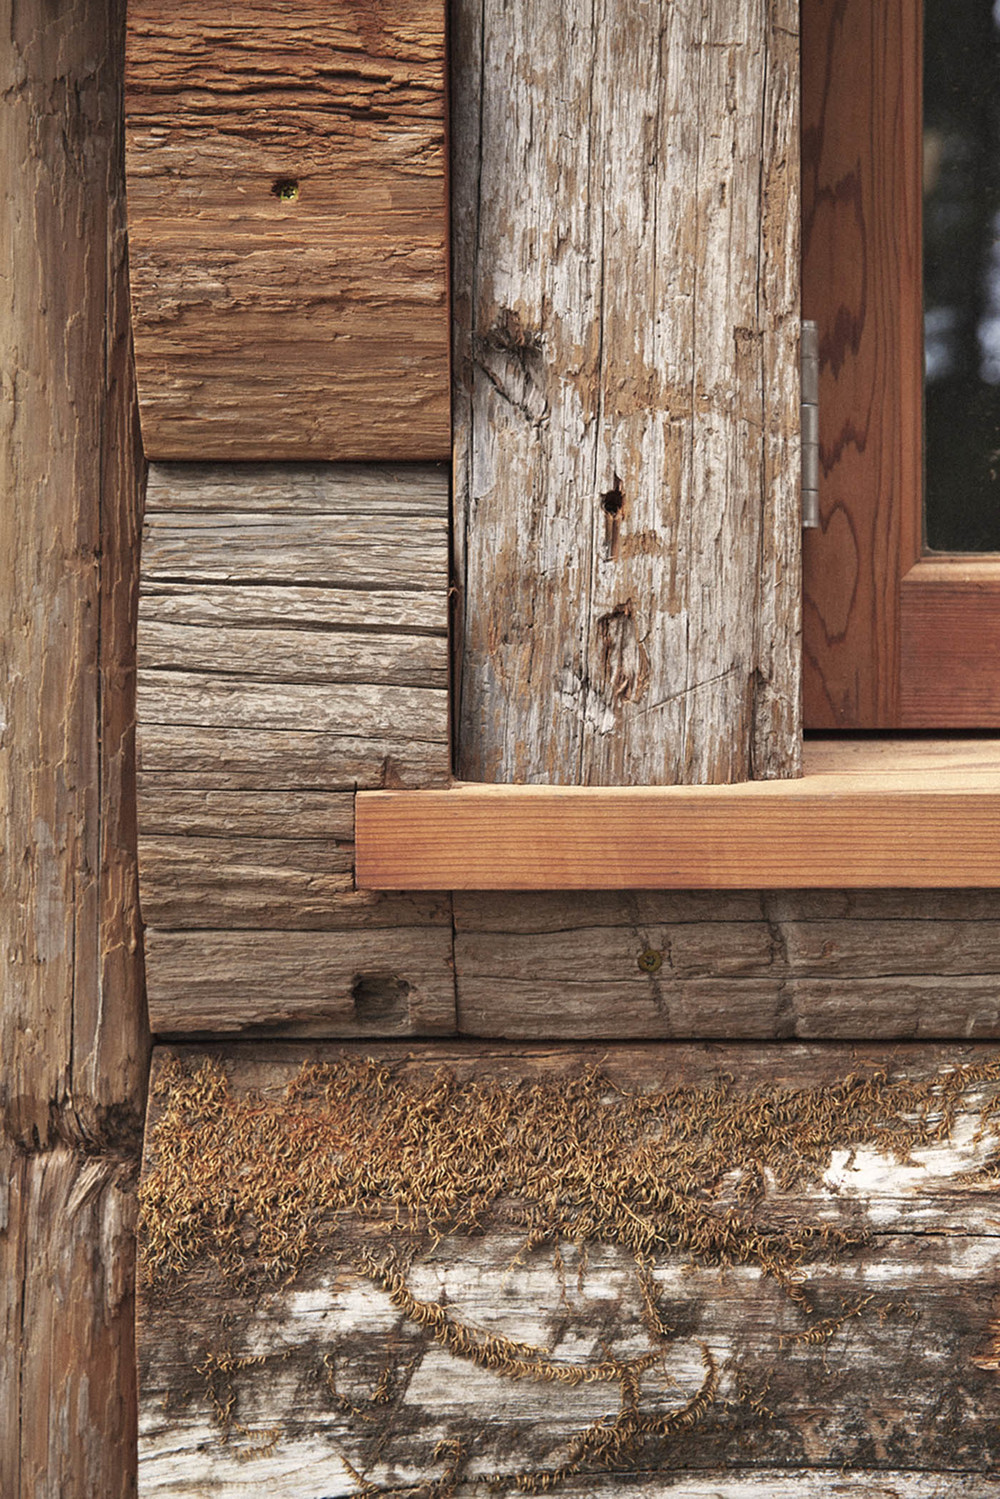 howard and cecil waite cabin restoration. inverness ridge, ca